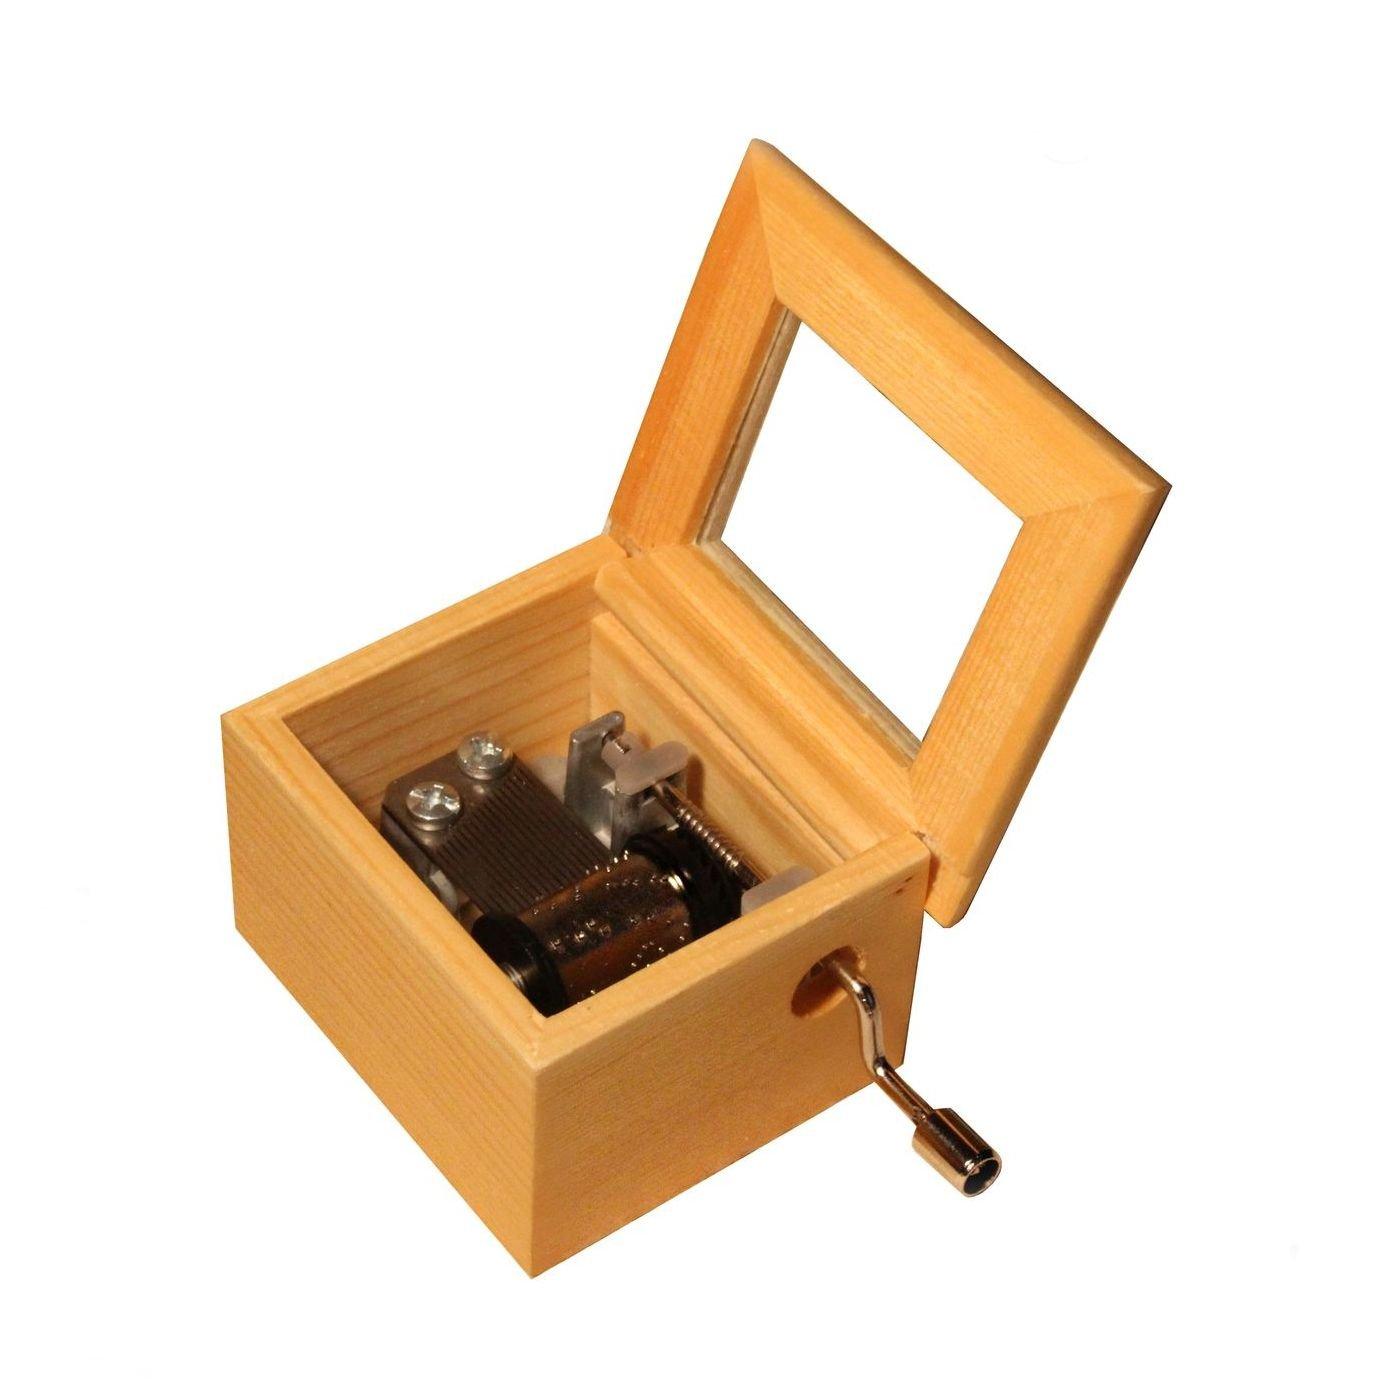 коробка   разные мелодиями, например Гарри Поттер